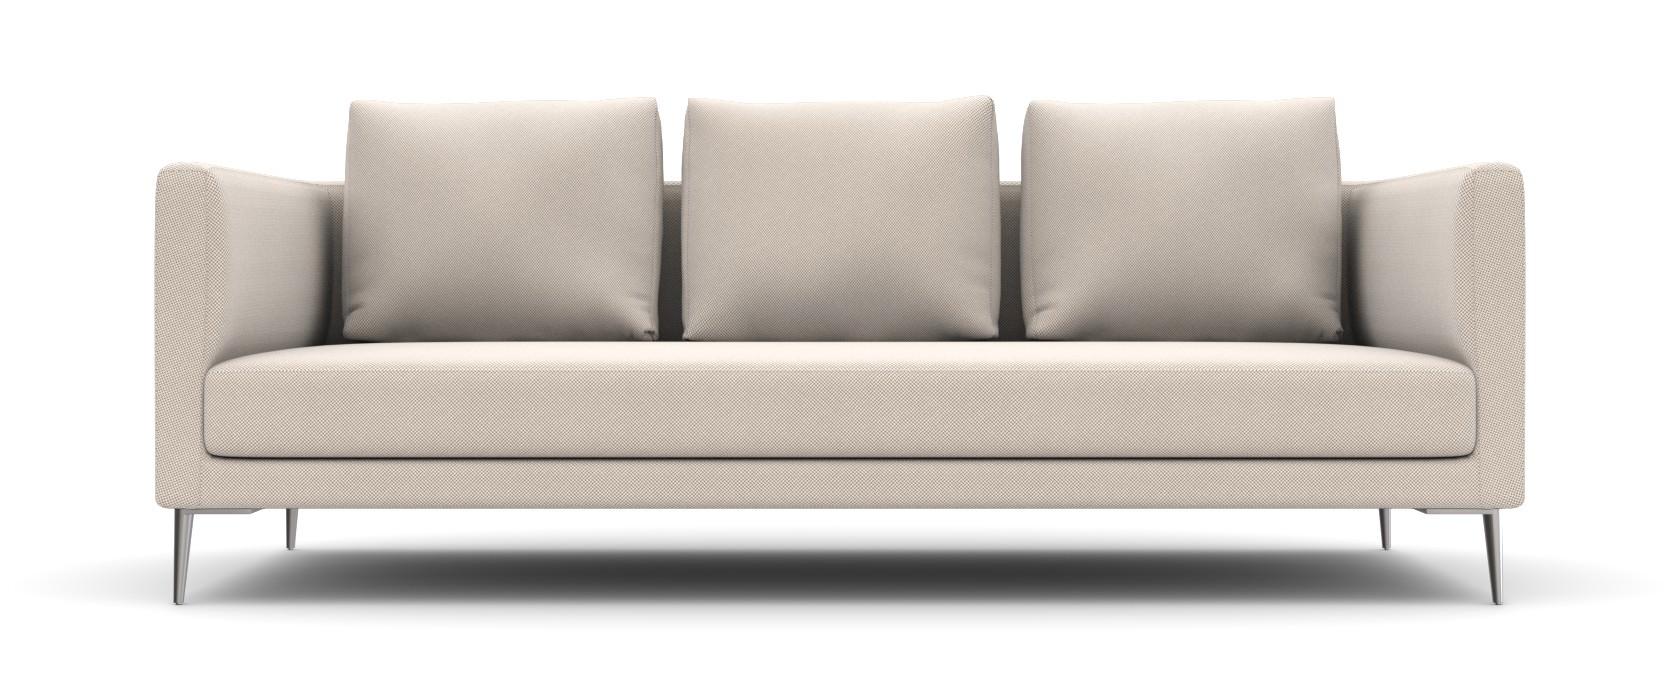 Тримісний диван Augusto - Pufetto